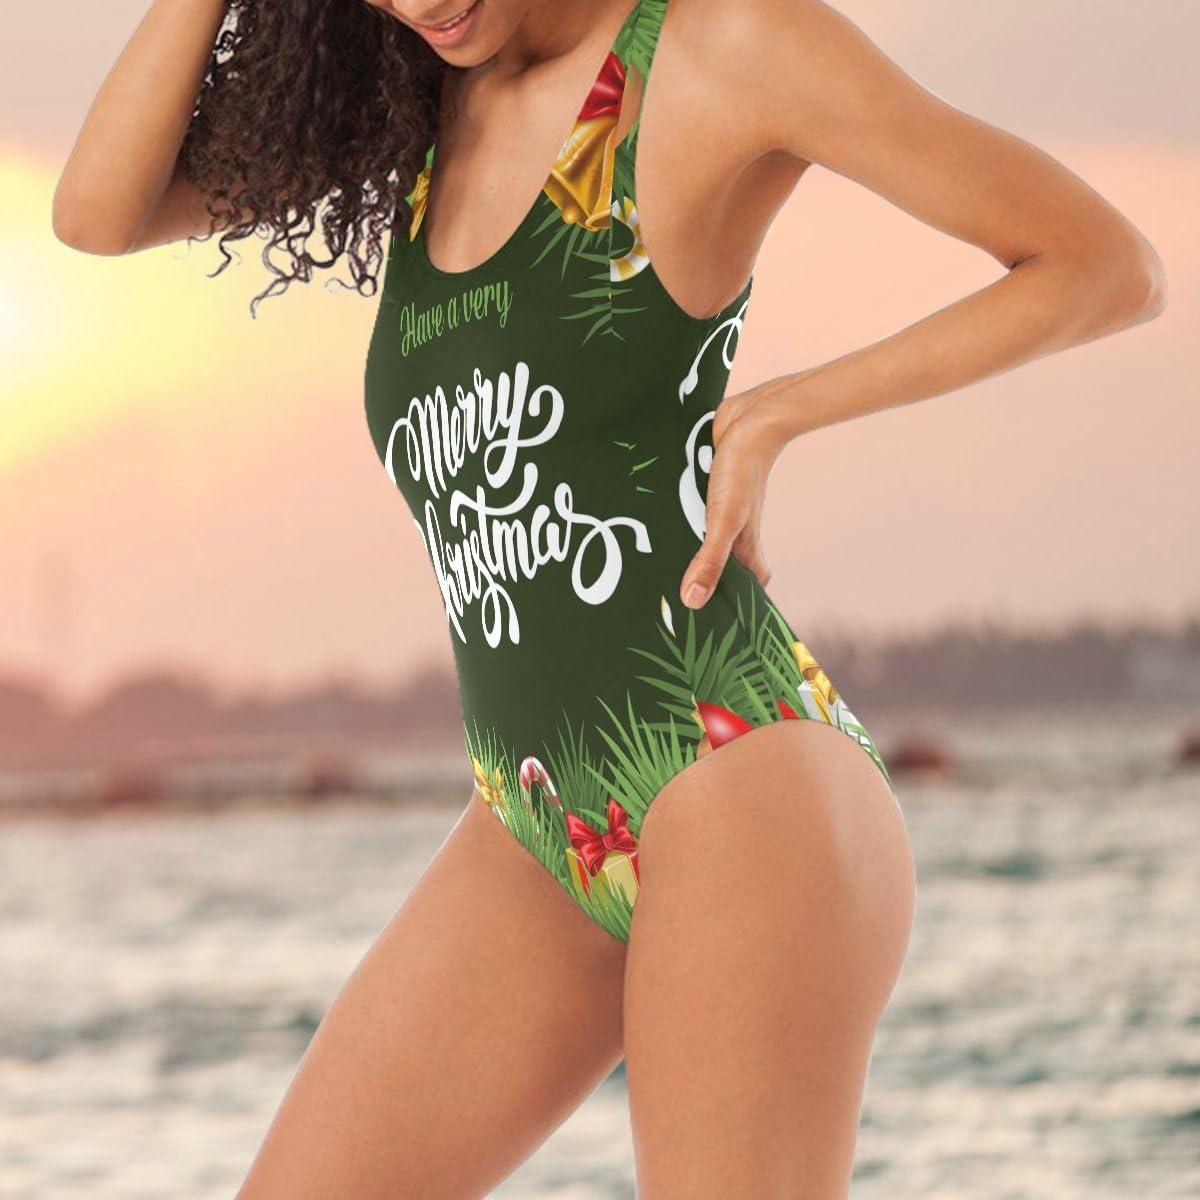 DragonSwordlinsu COOSUN Womens Merry Christmas One-Piece Swimsuit Scoop Back Monokini Swimwear Bathing Suit